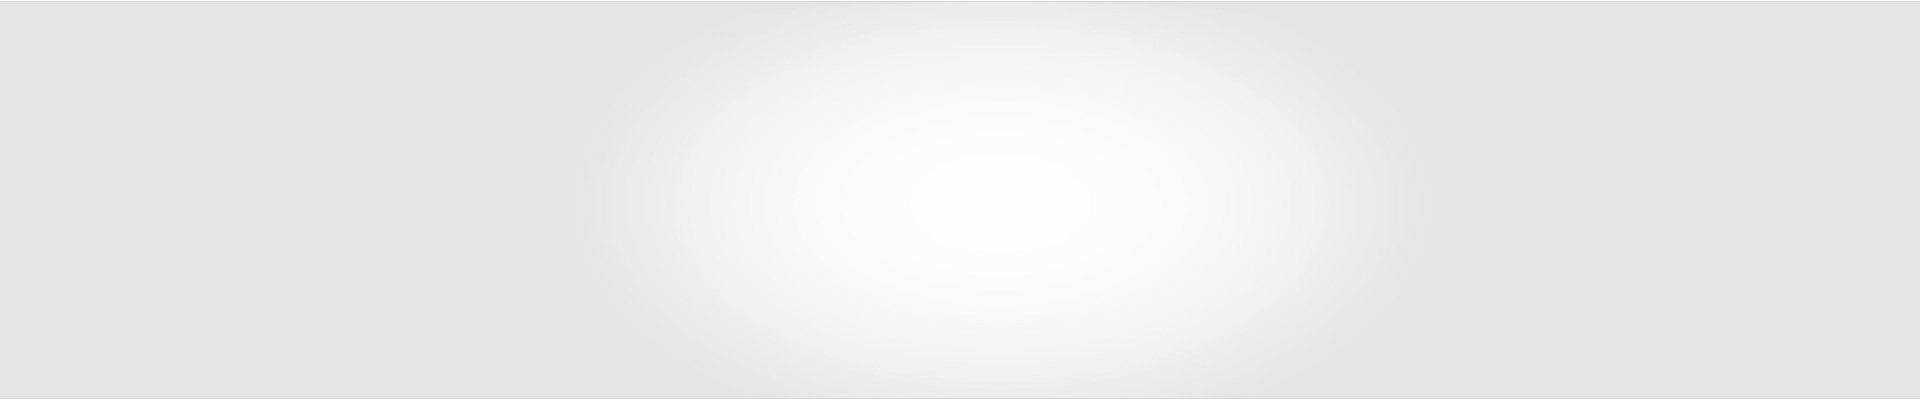 Website Design Services Background